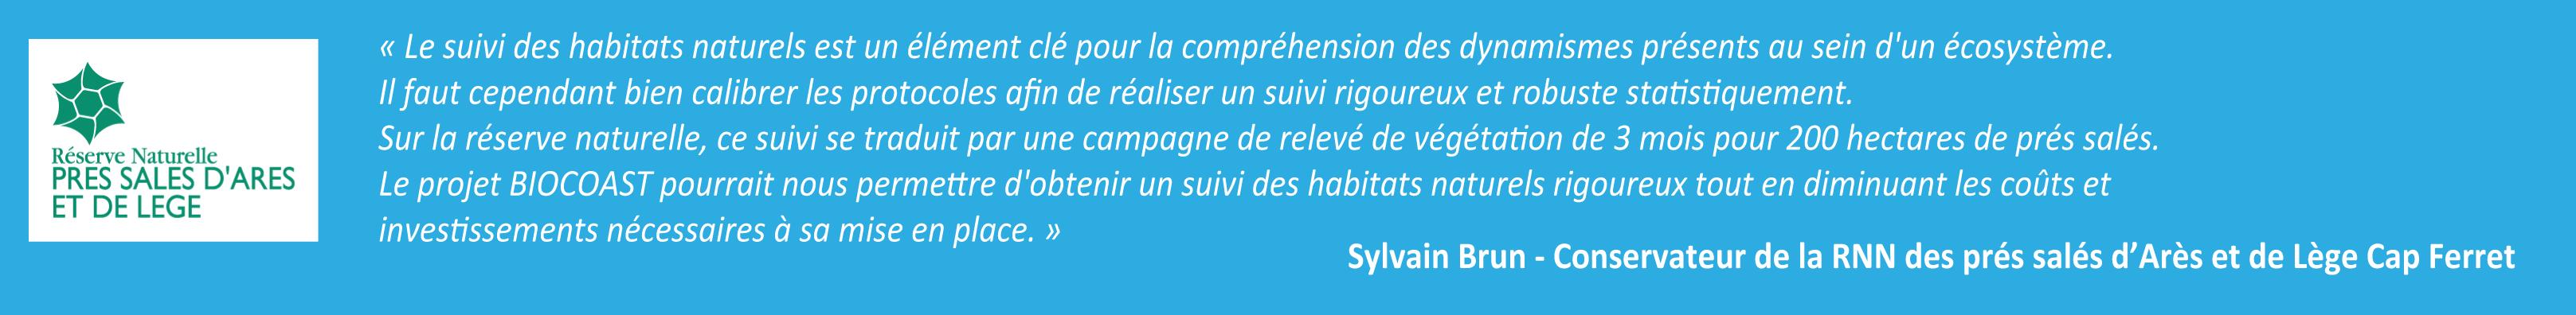 Sylvain Brun